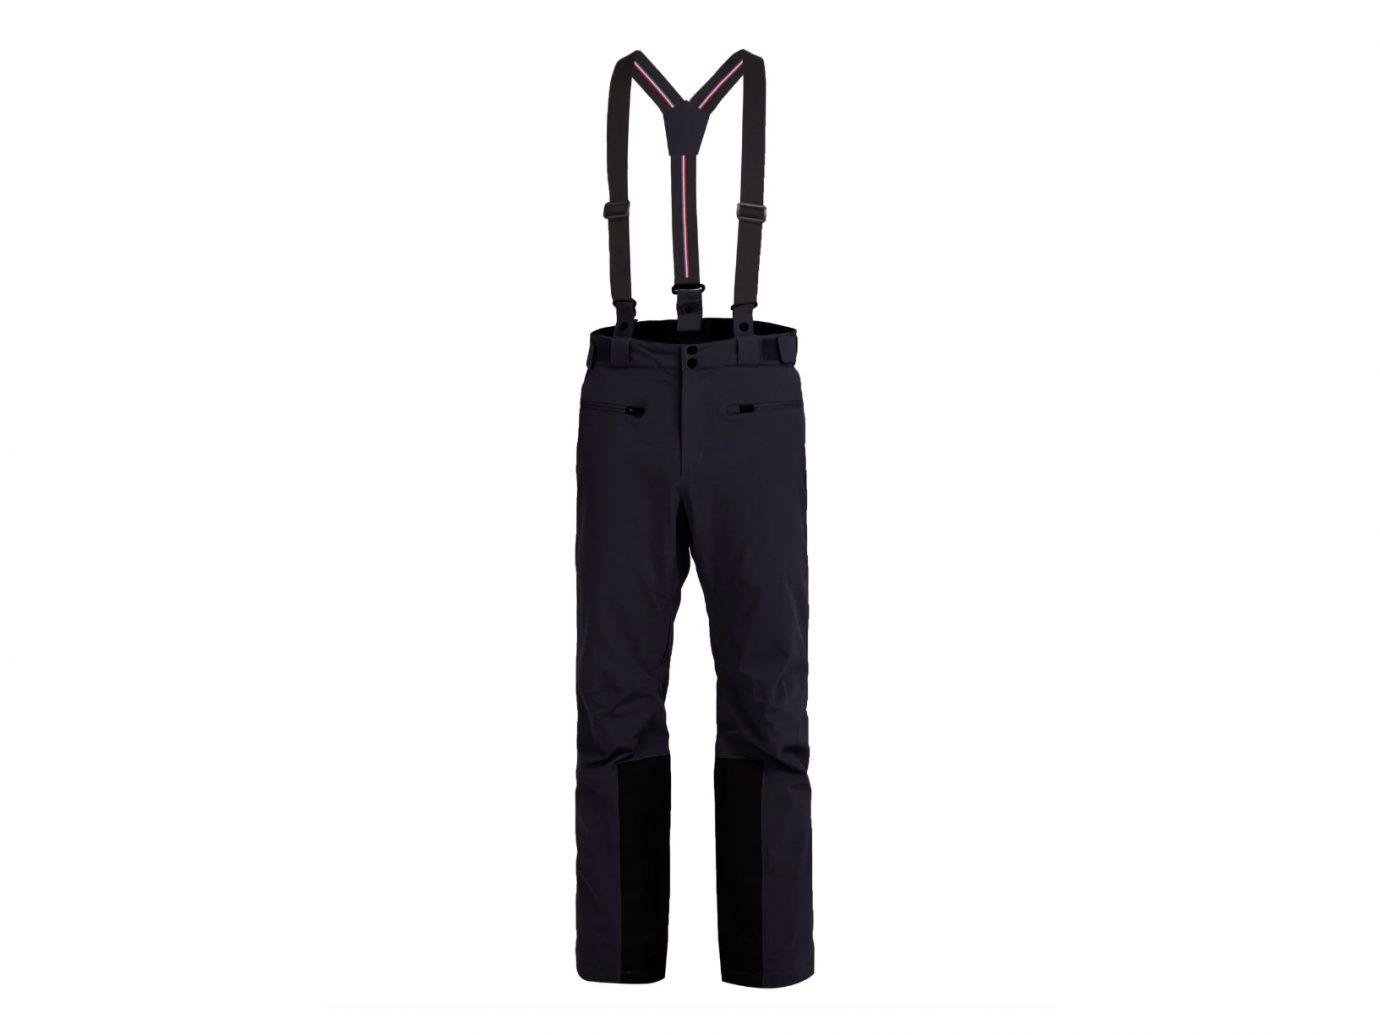 Fusalp Straton ski trousers